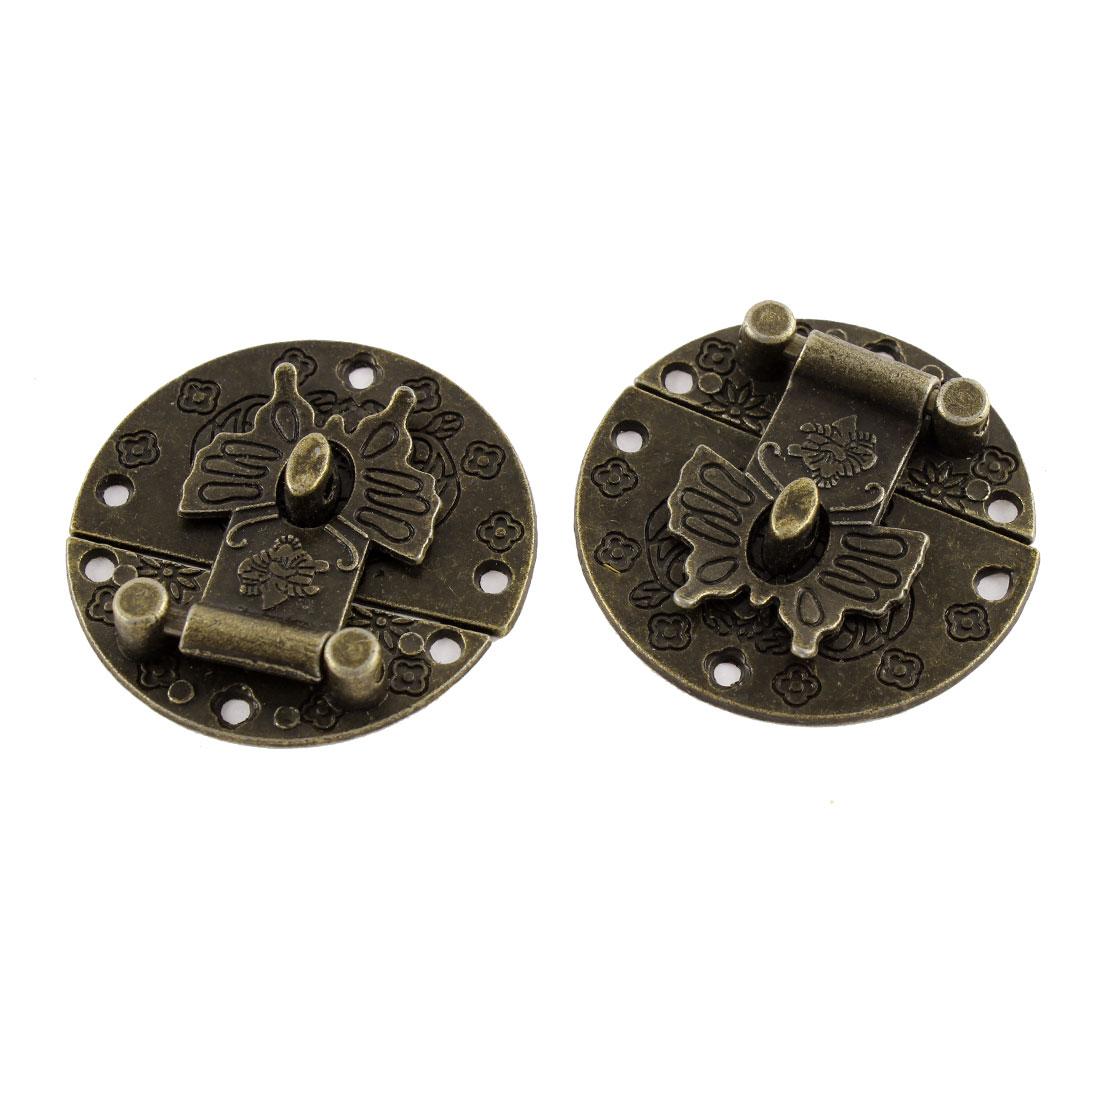 2pcs 40mmx40mm Bronze Pattern Carved Box Suitcase Decorative Hasp Latch Lock